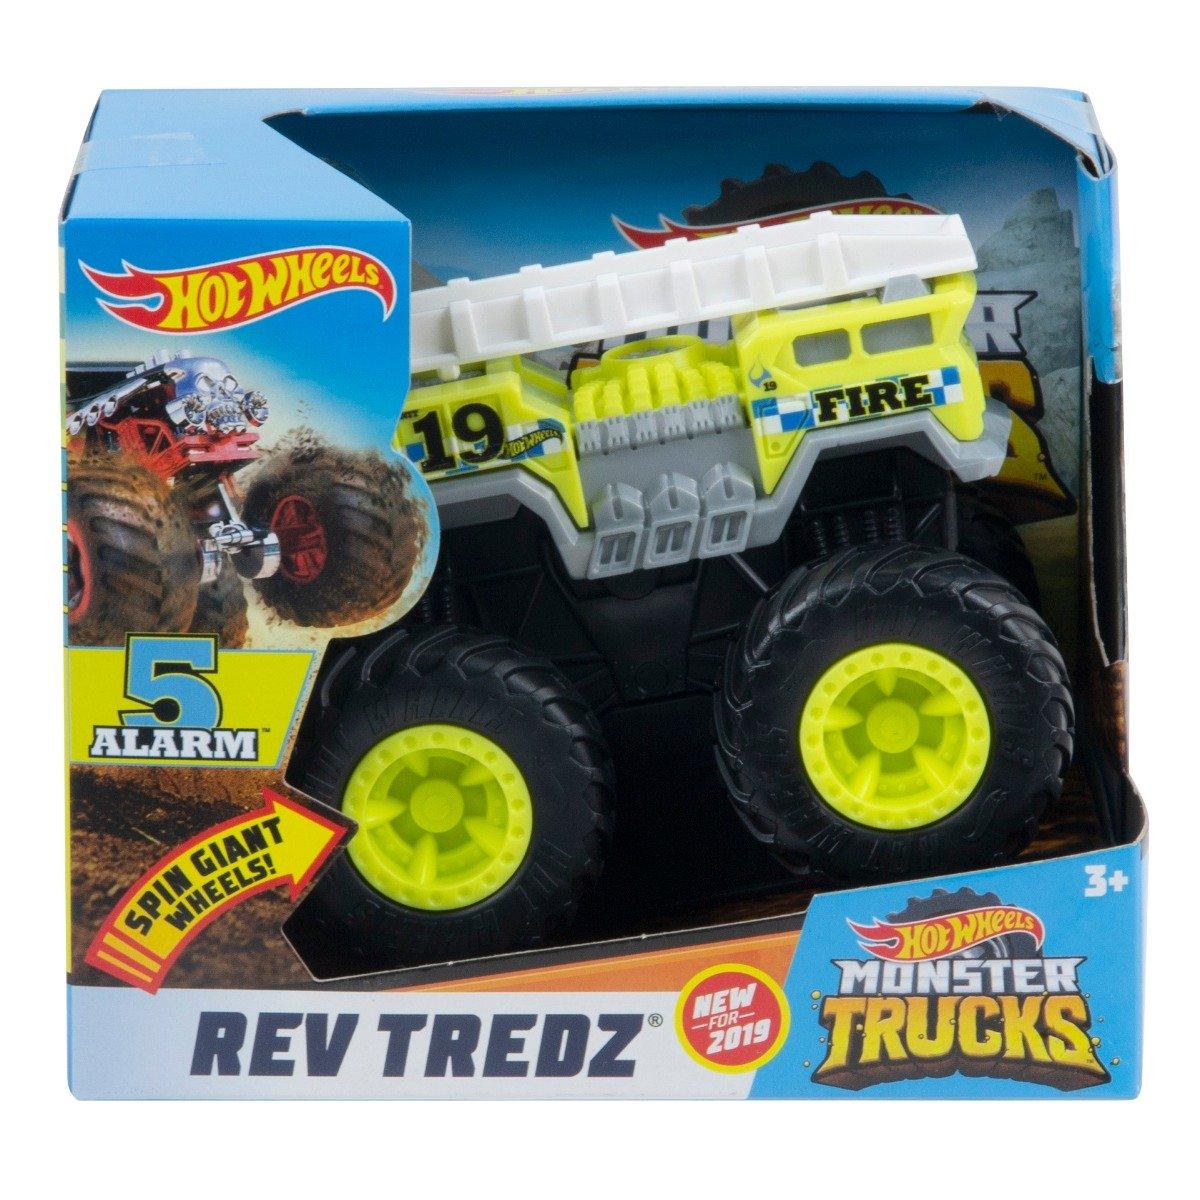 Masinuta Hot Wheels Rev Tredz, 5 Alarm GBV11